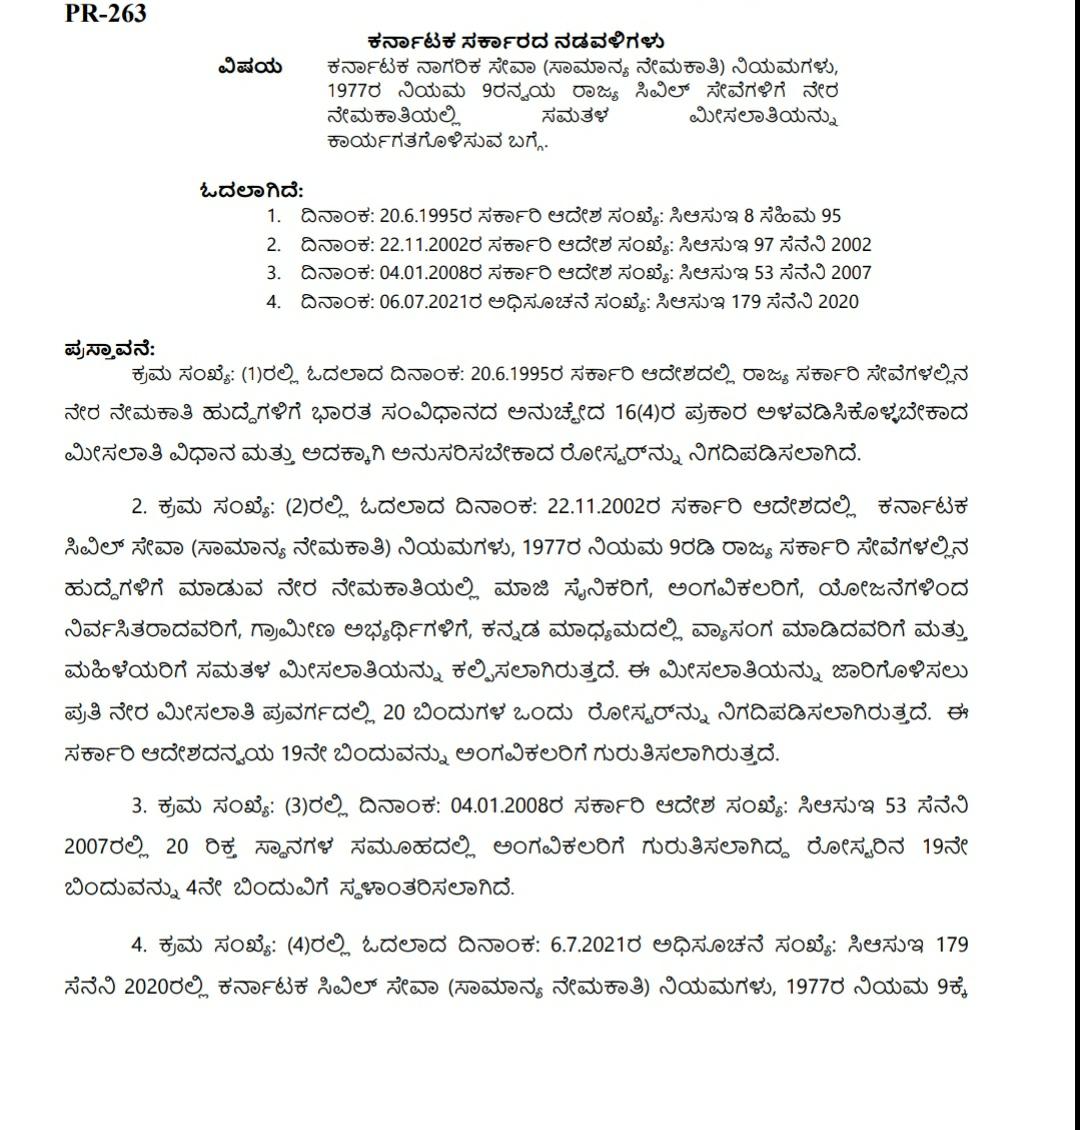 Karnataka Civil Service (General Recruitment) Regulations, Regulation 9 of 1977 Directive on Implementation of Equal Reservation in Direct Recruitment to State Civil Services